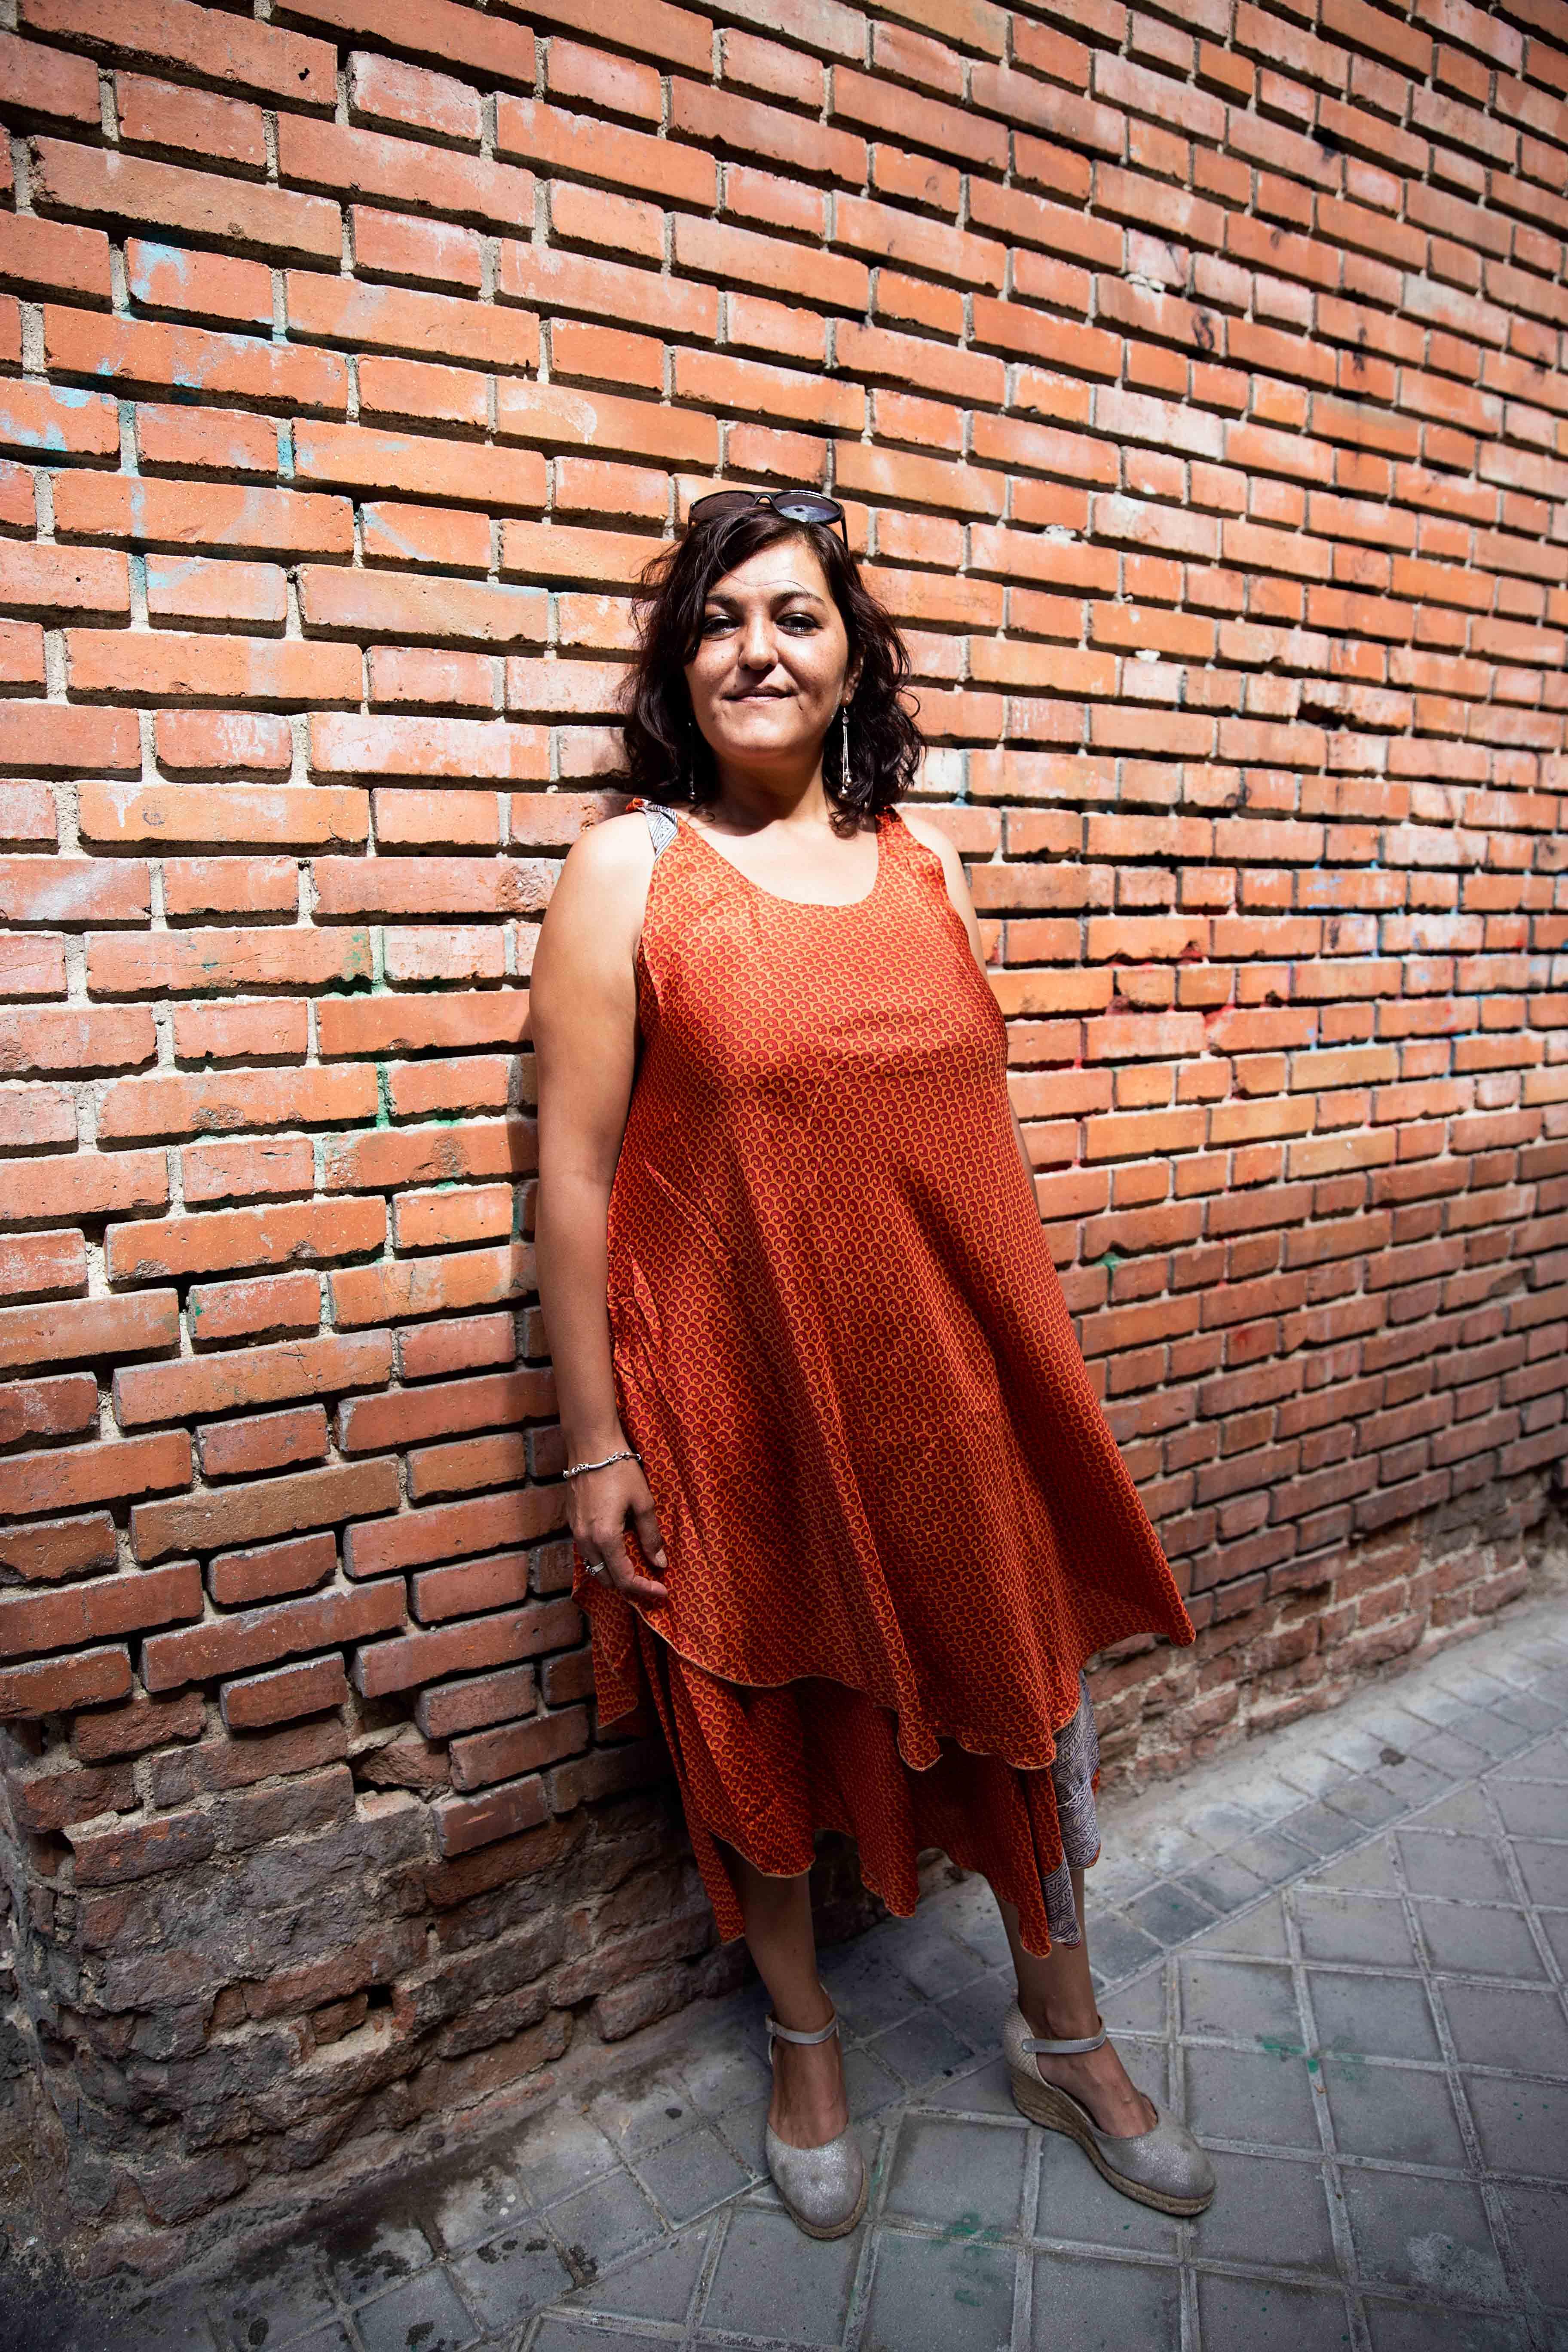 Celia Montoya from Ververipen. Photo by Bex Wade